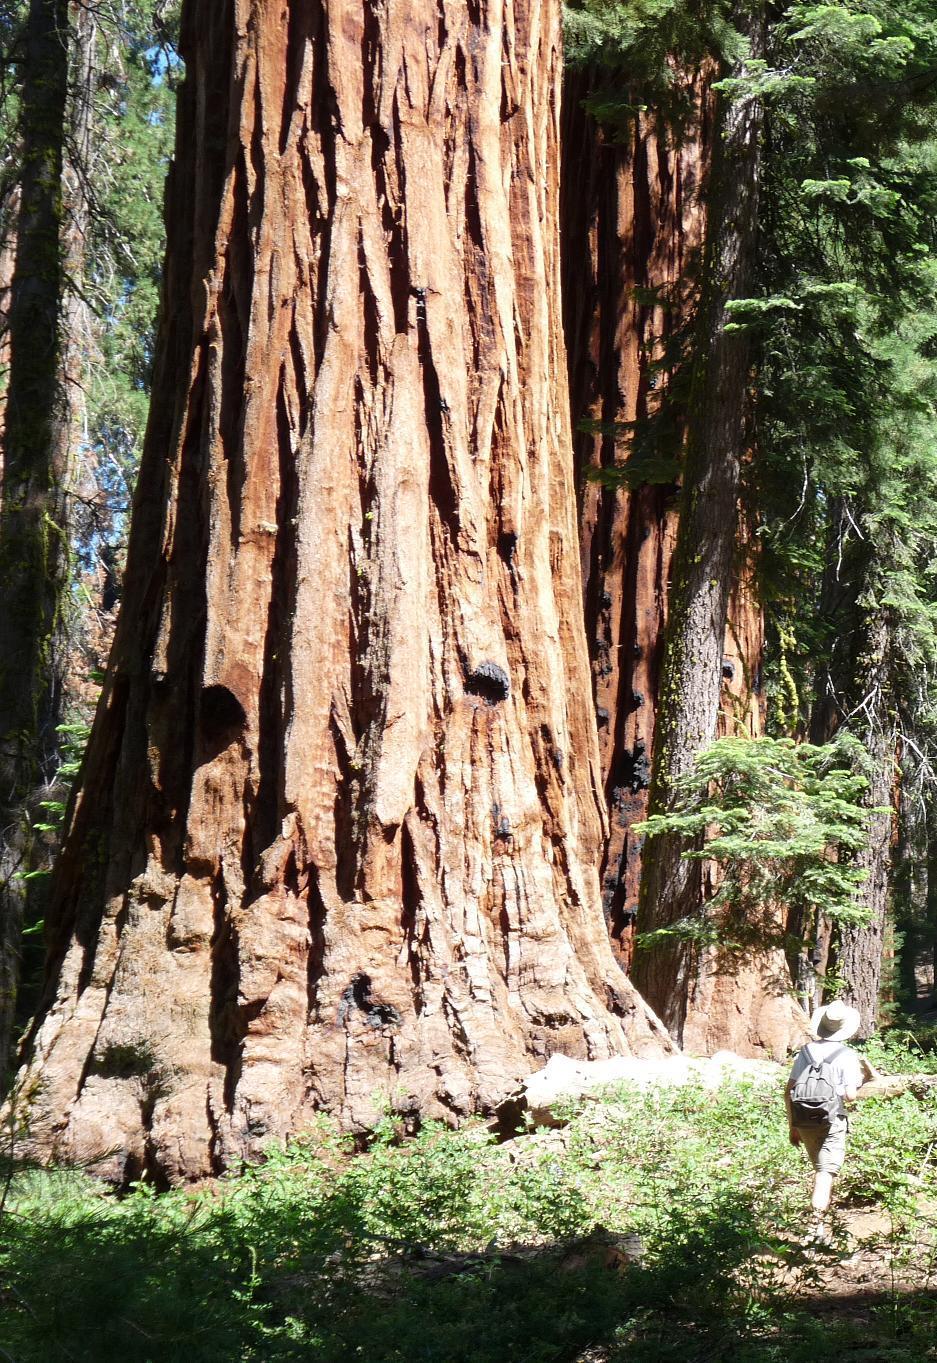 sequoia.jpg